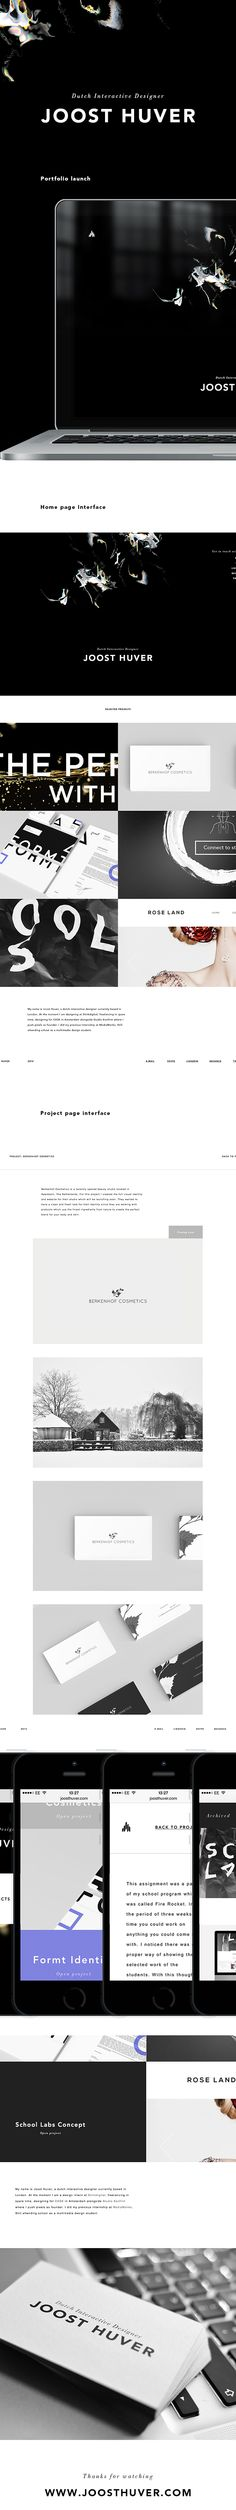 Portfolio launch 2014 by Joost Huver, via Behance #portfolio